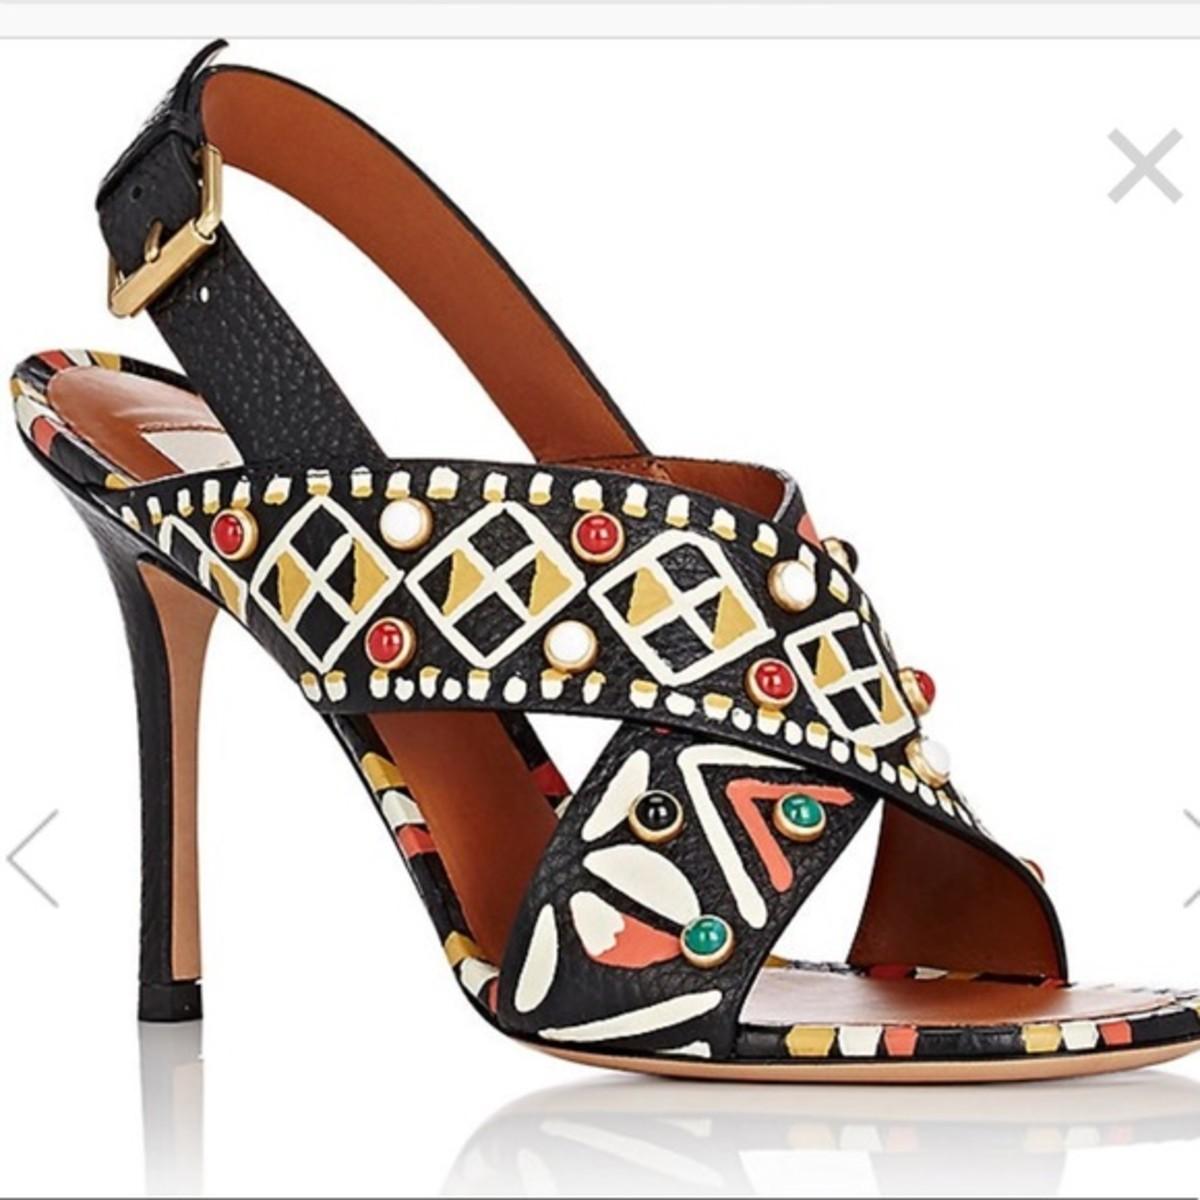 Hand-Painted Heels